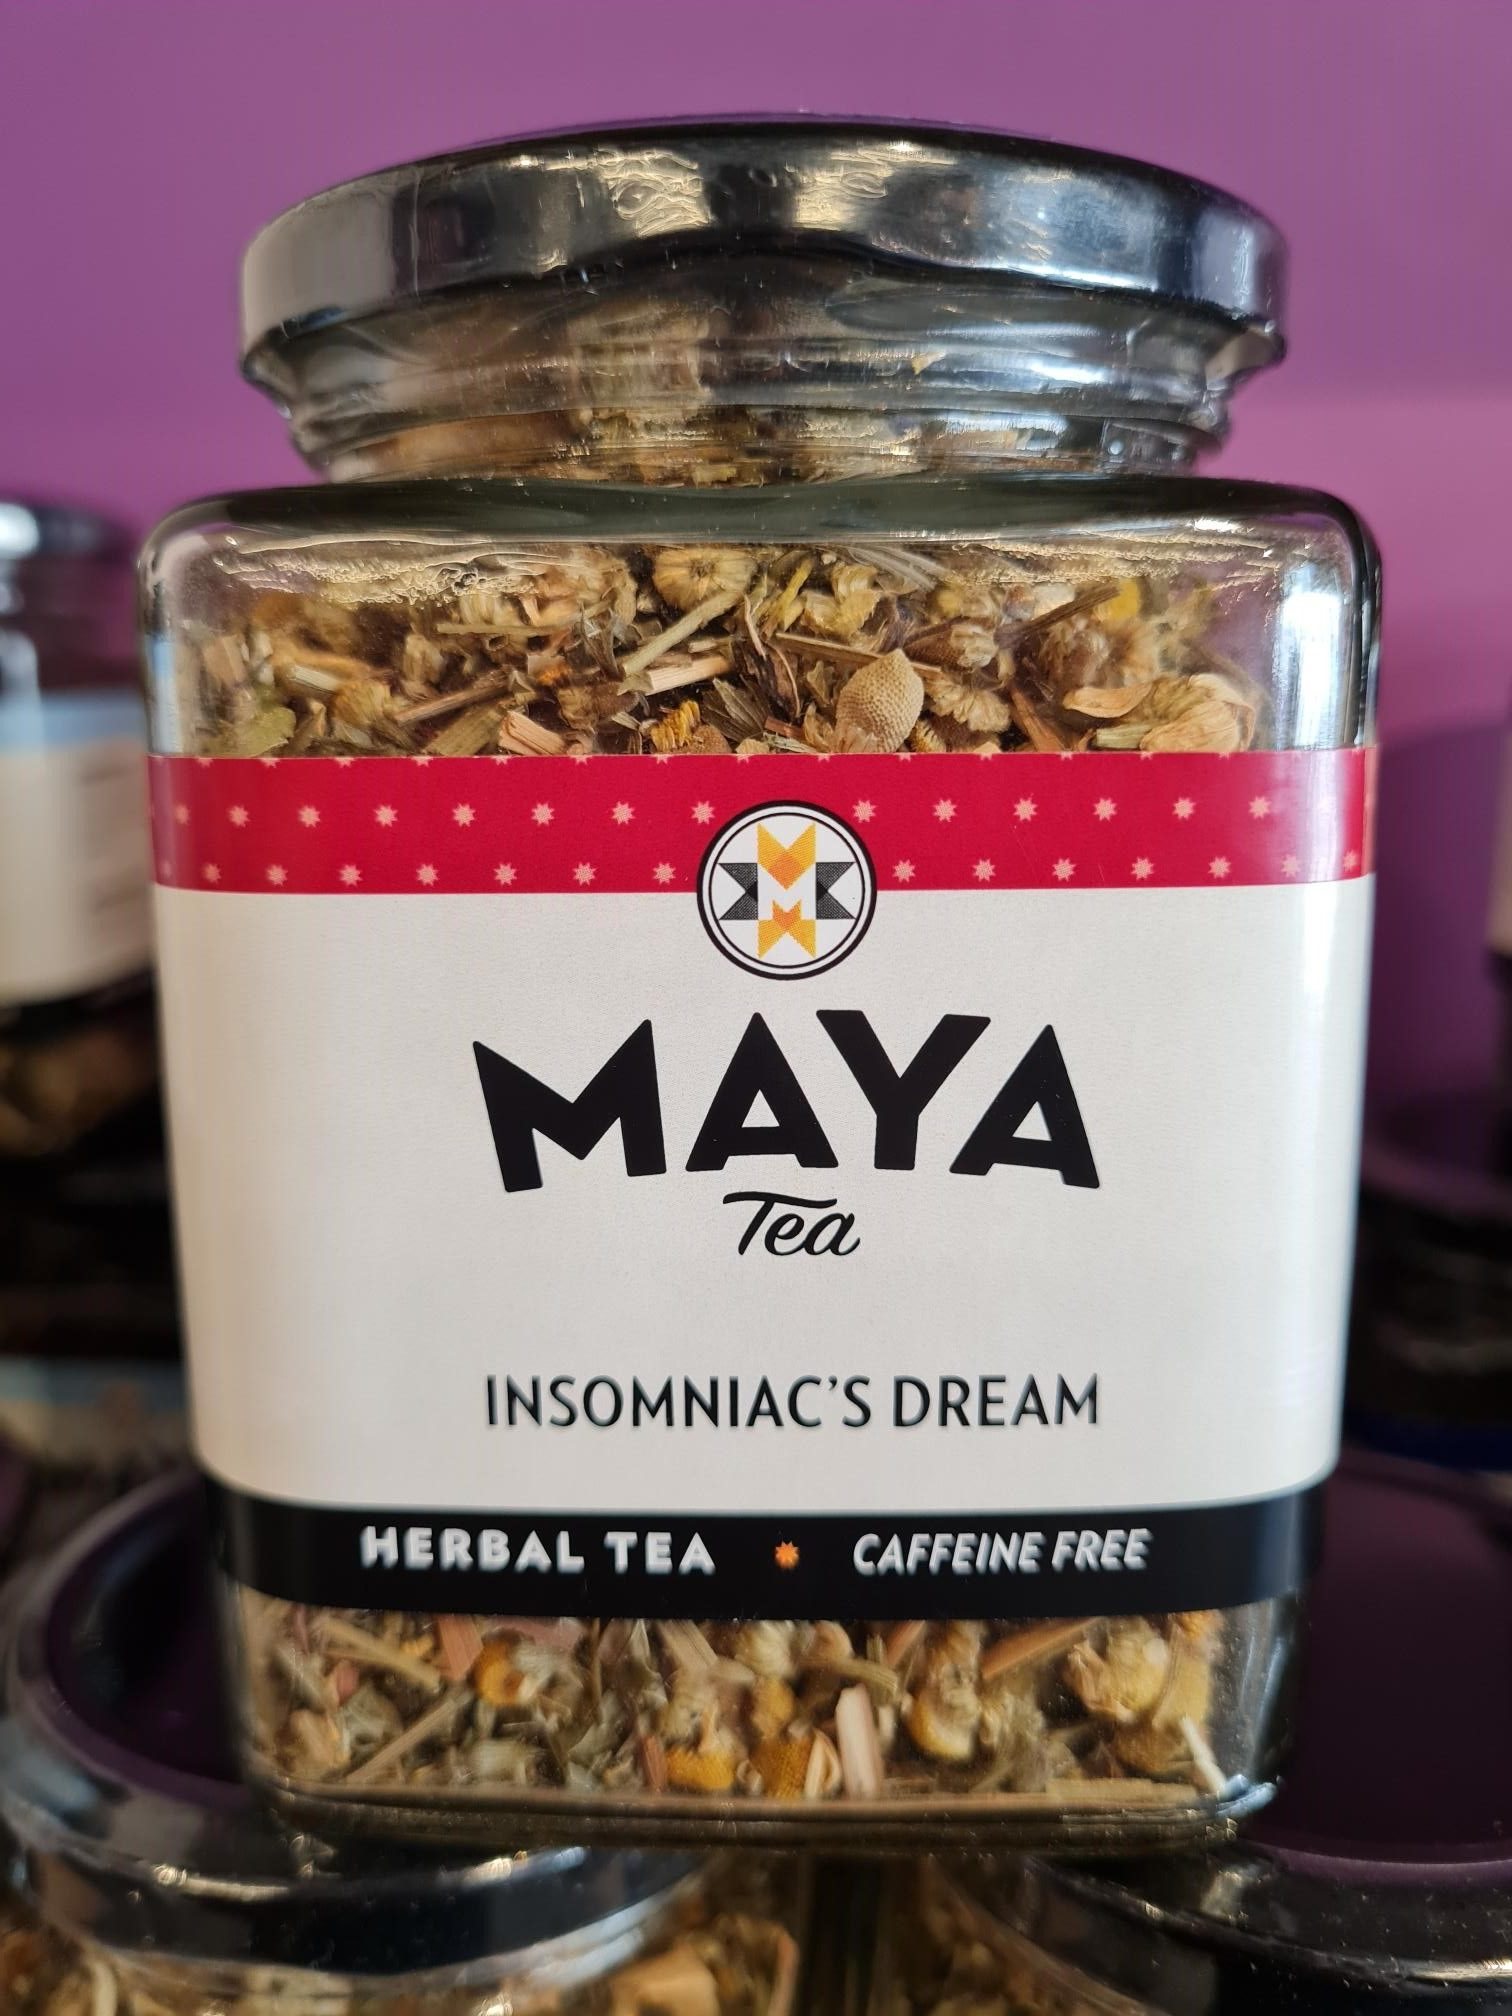 MAYA Insomniac's Dream Loose Tea